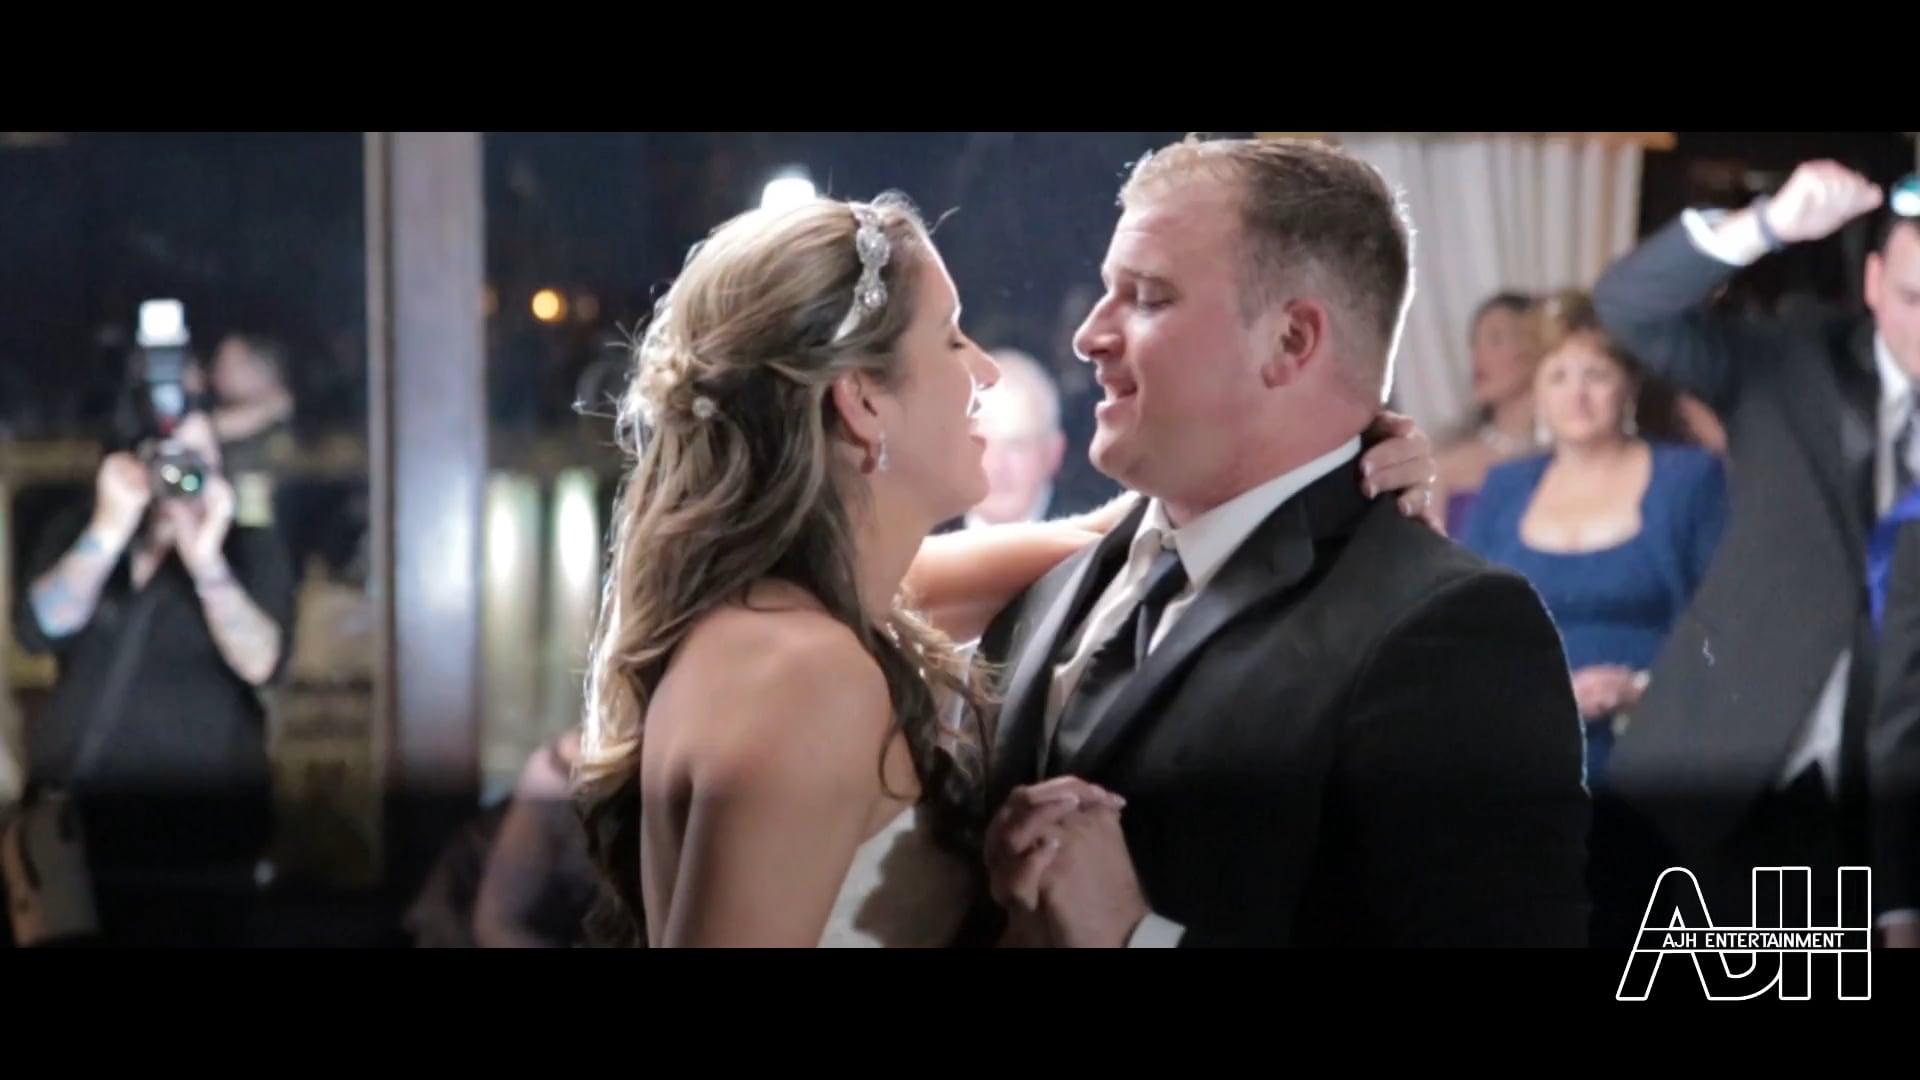 AJH Entertainment Weddings: Stephanie & Carmine, Shadowbrook at Shrewsbury, NJ